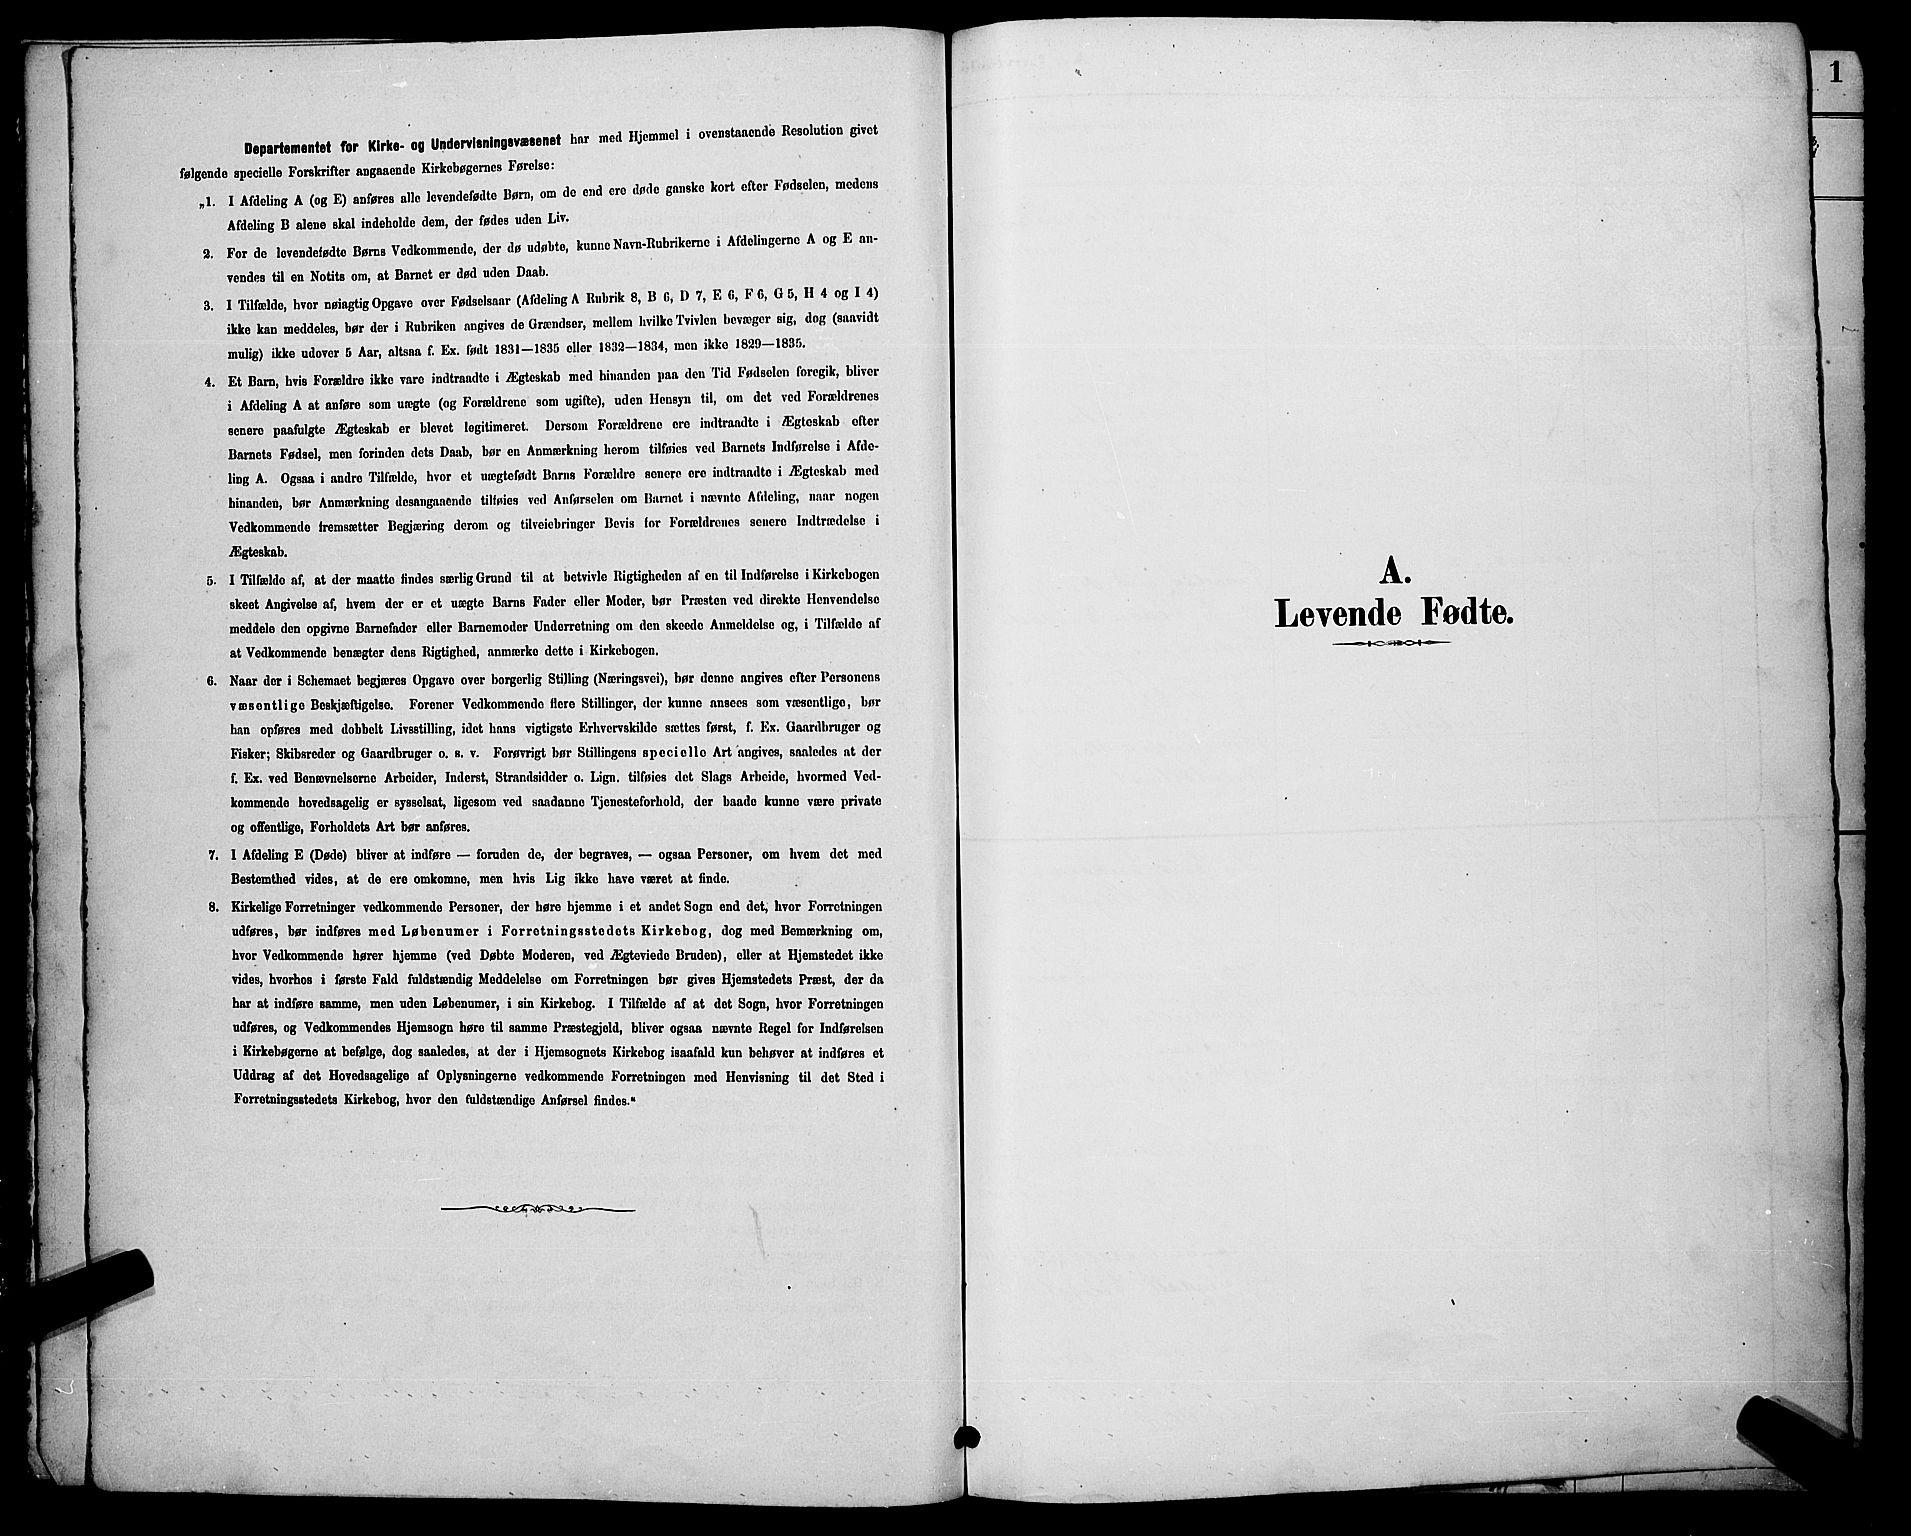 SAKO, Sigdal kirkebøker, G/Ga/L0005: Klokkerbok nr. I 5, 1886-1900